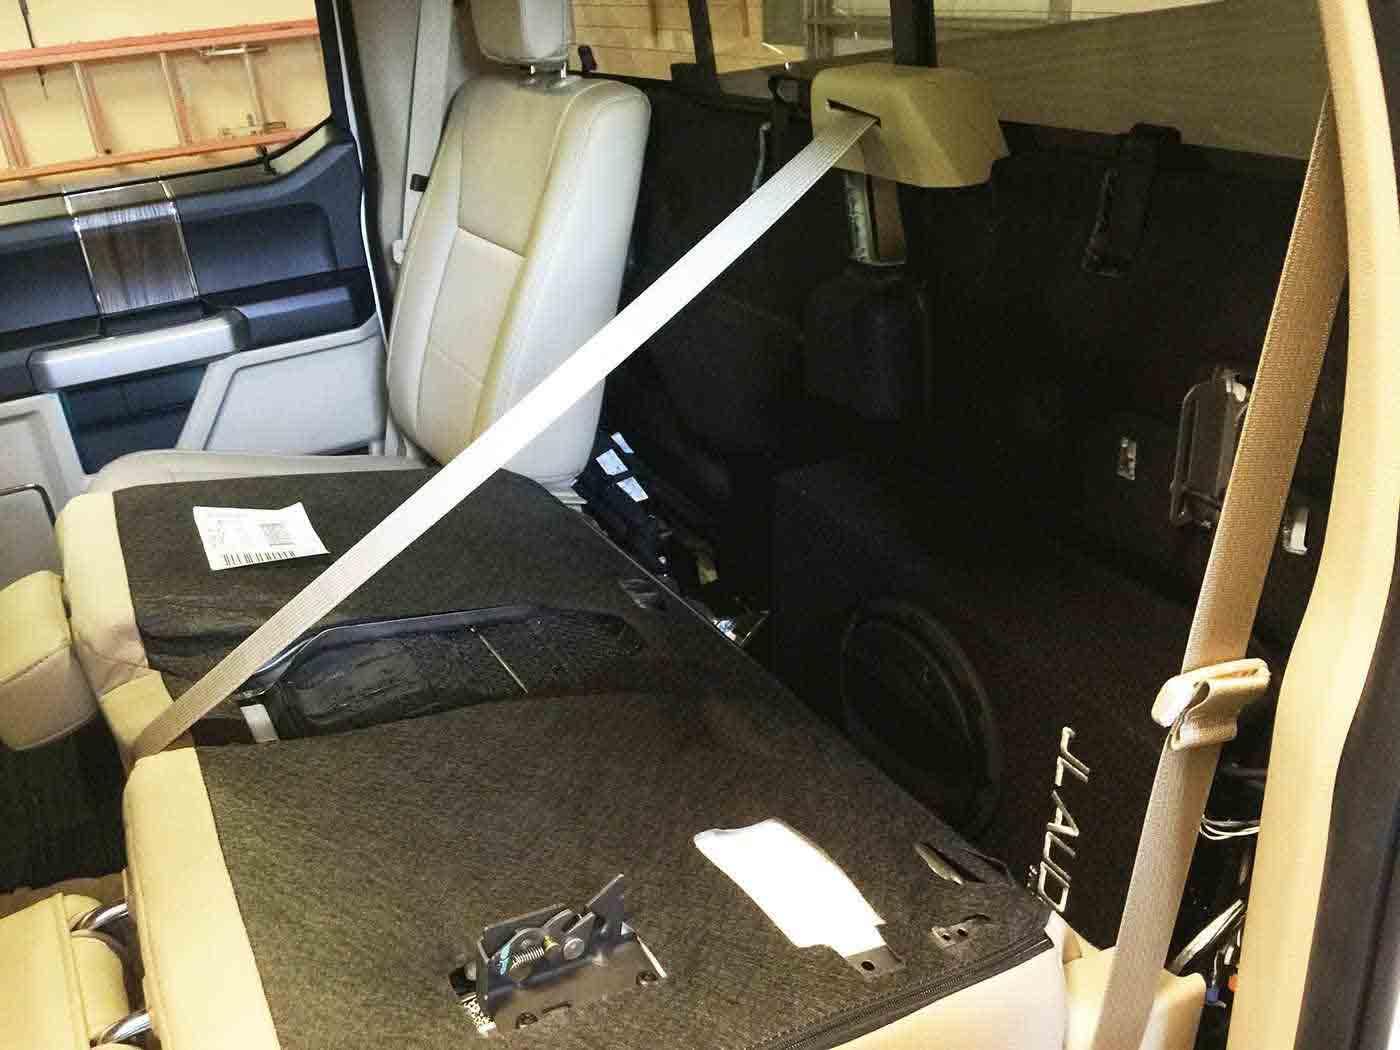 Ford F150 2015 Subwoofer Amplifier Retrofits (8)